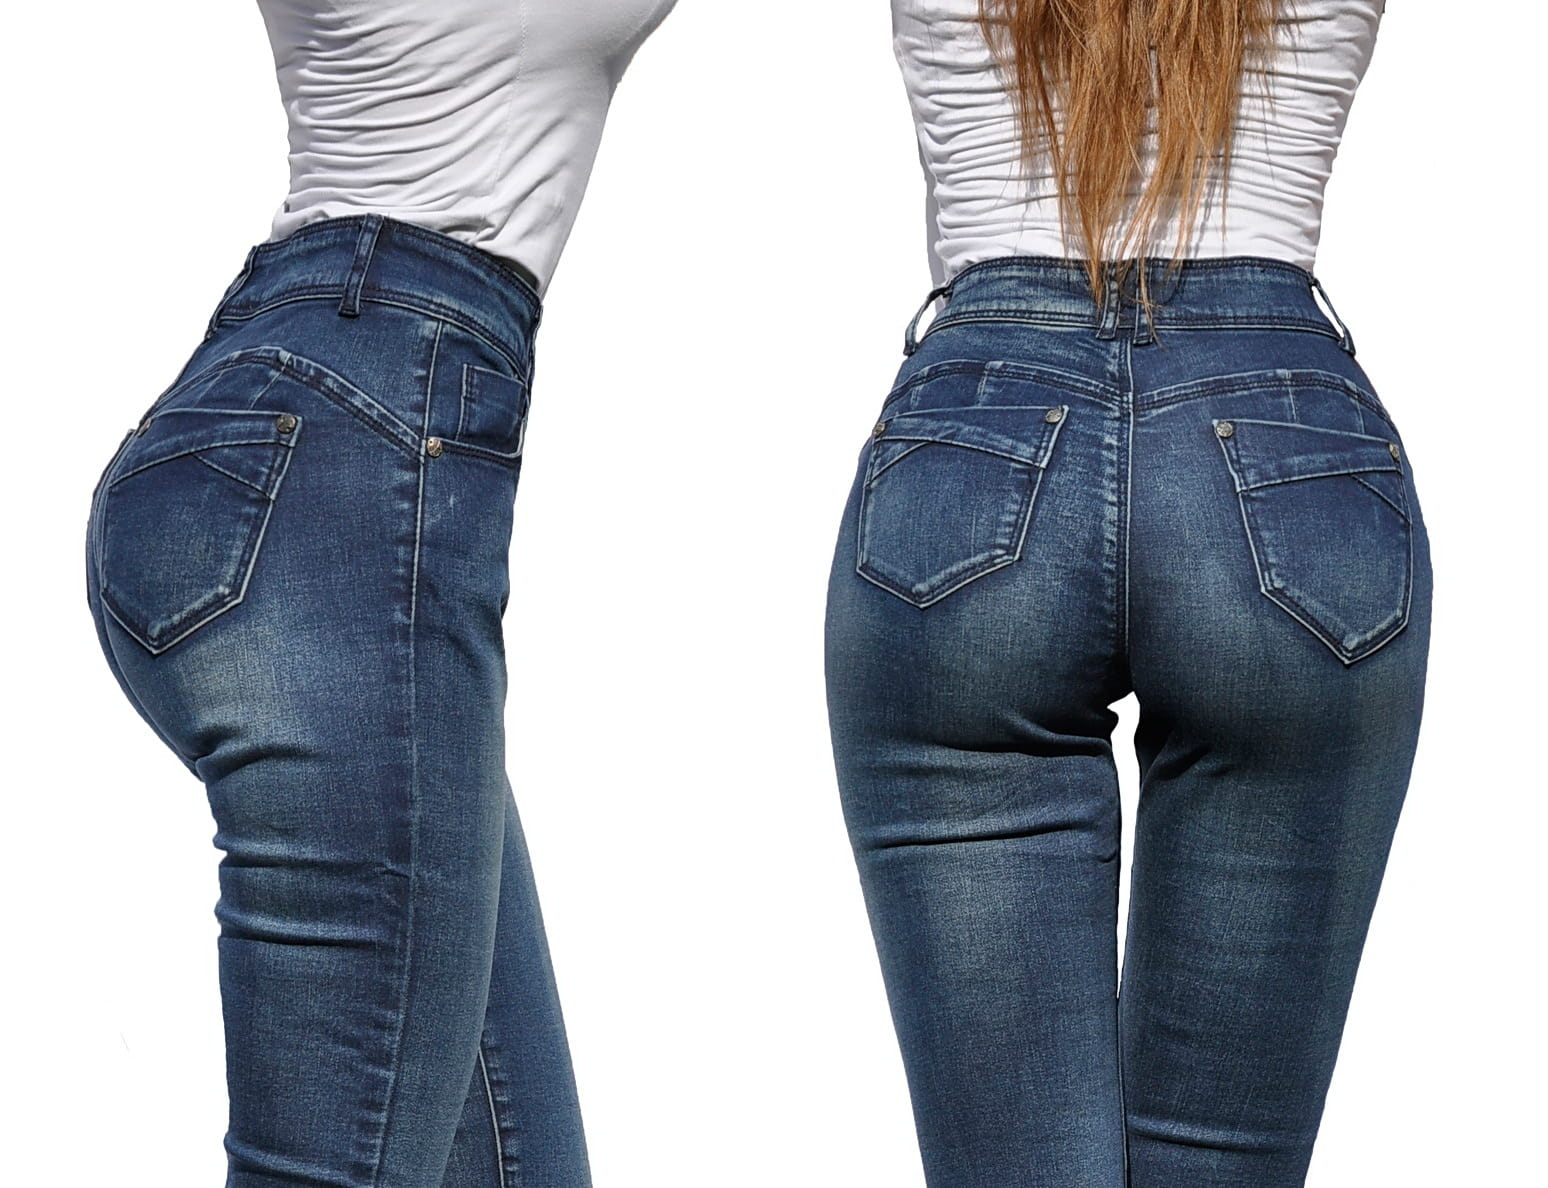 4c30cdd0 Spodnie Jeans Mamuśki Klasyczne PushUp #115